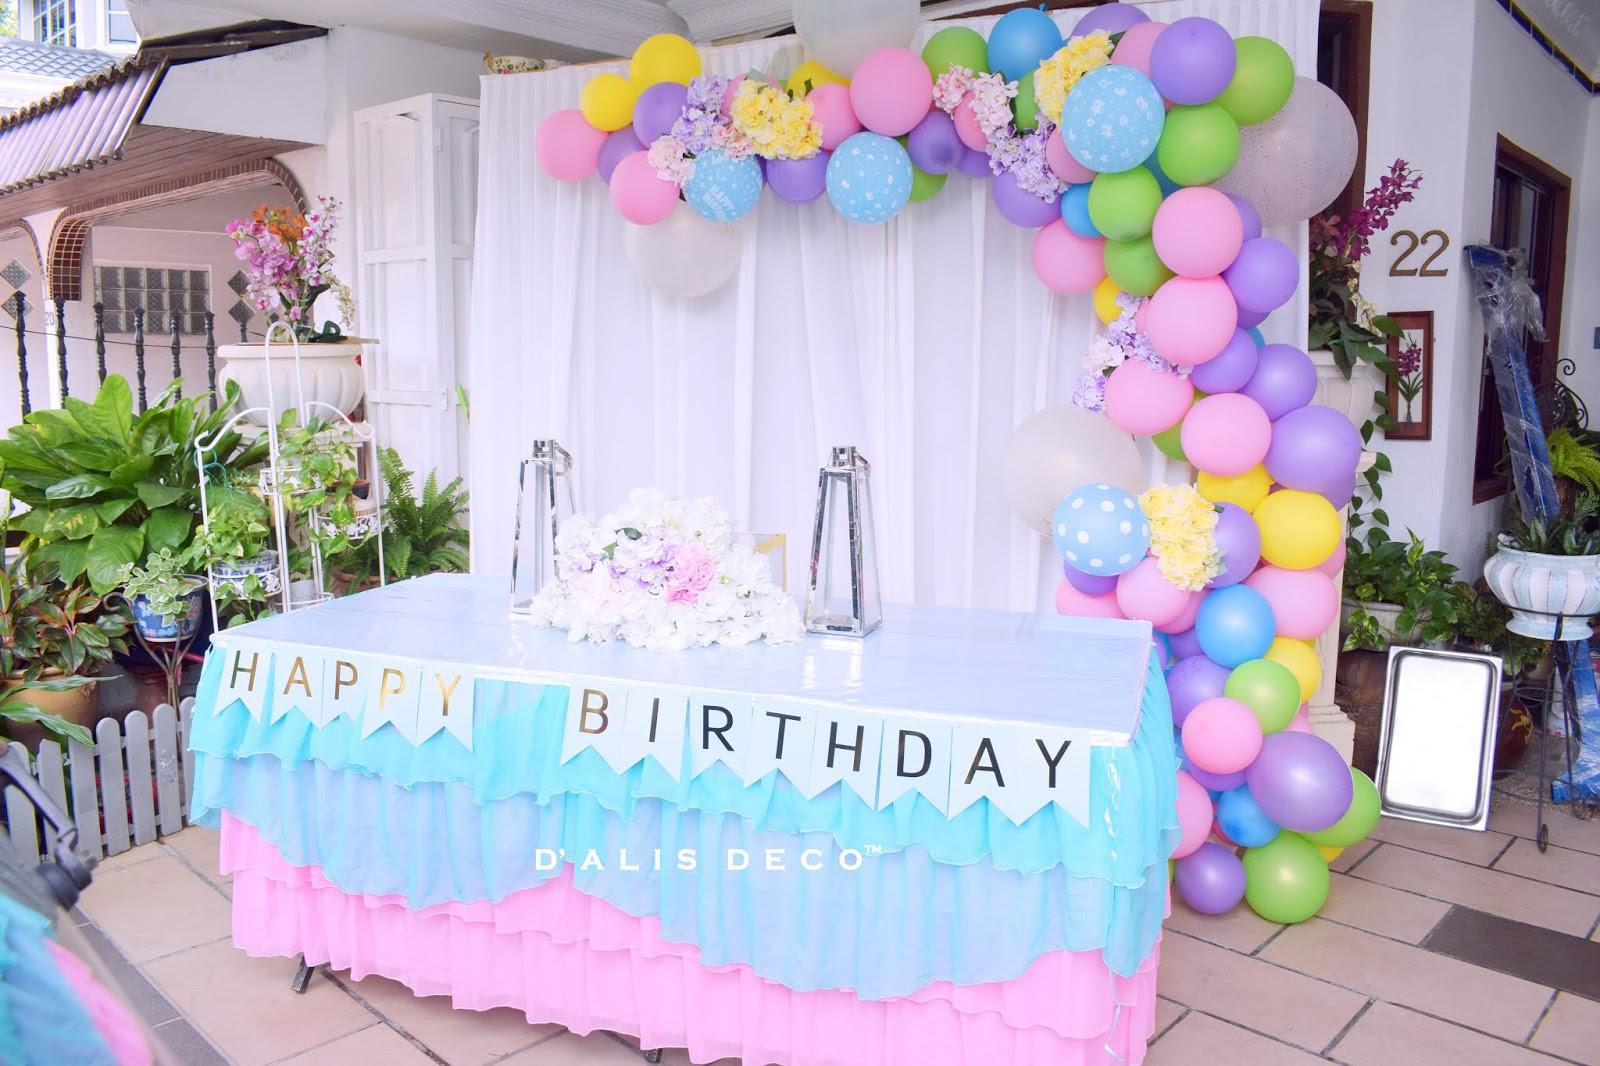 D Alis Deco Birthday Colourful